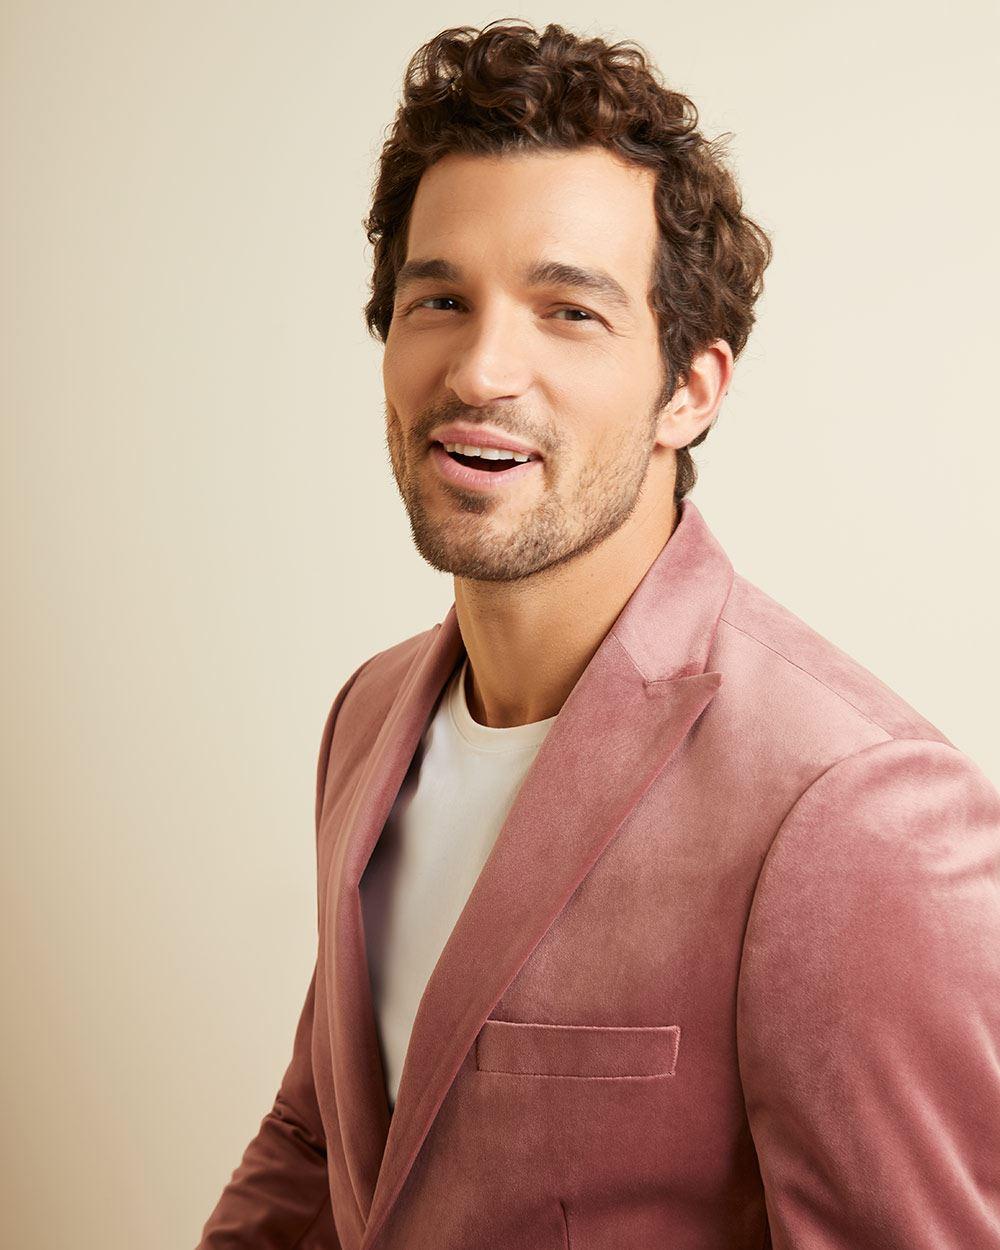 Slim Fit Velvet Suit Blazer by Rw & Co